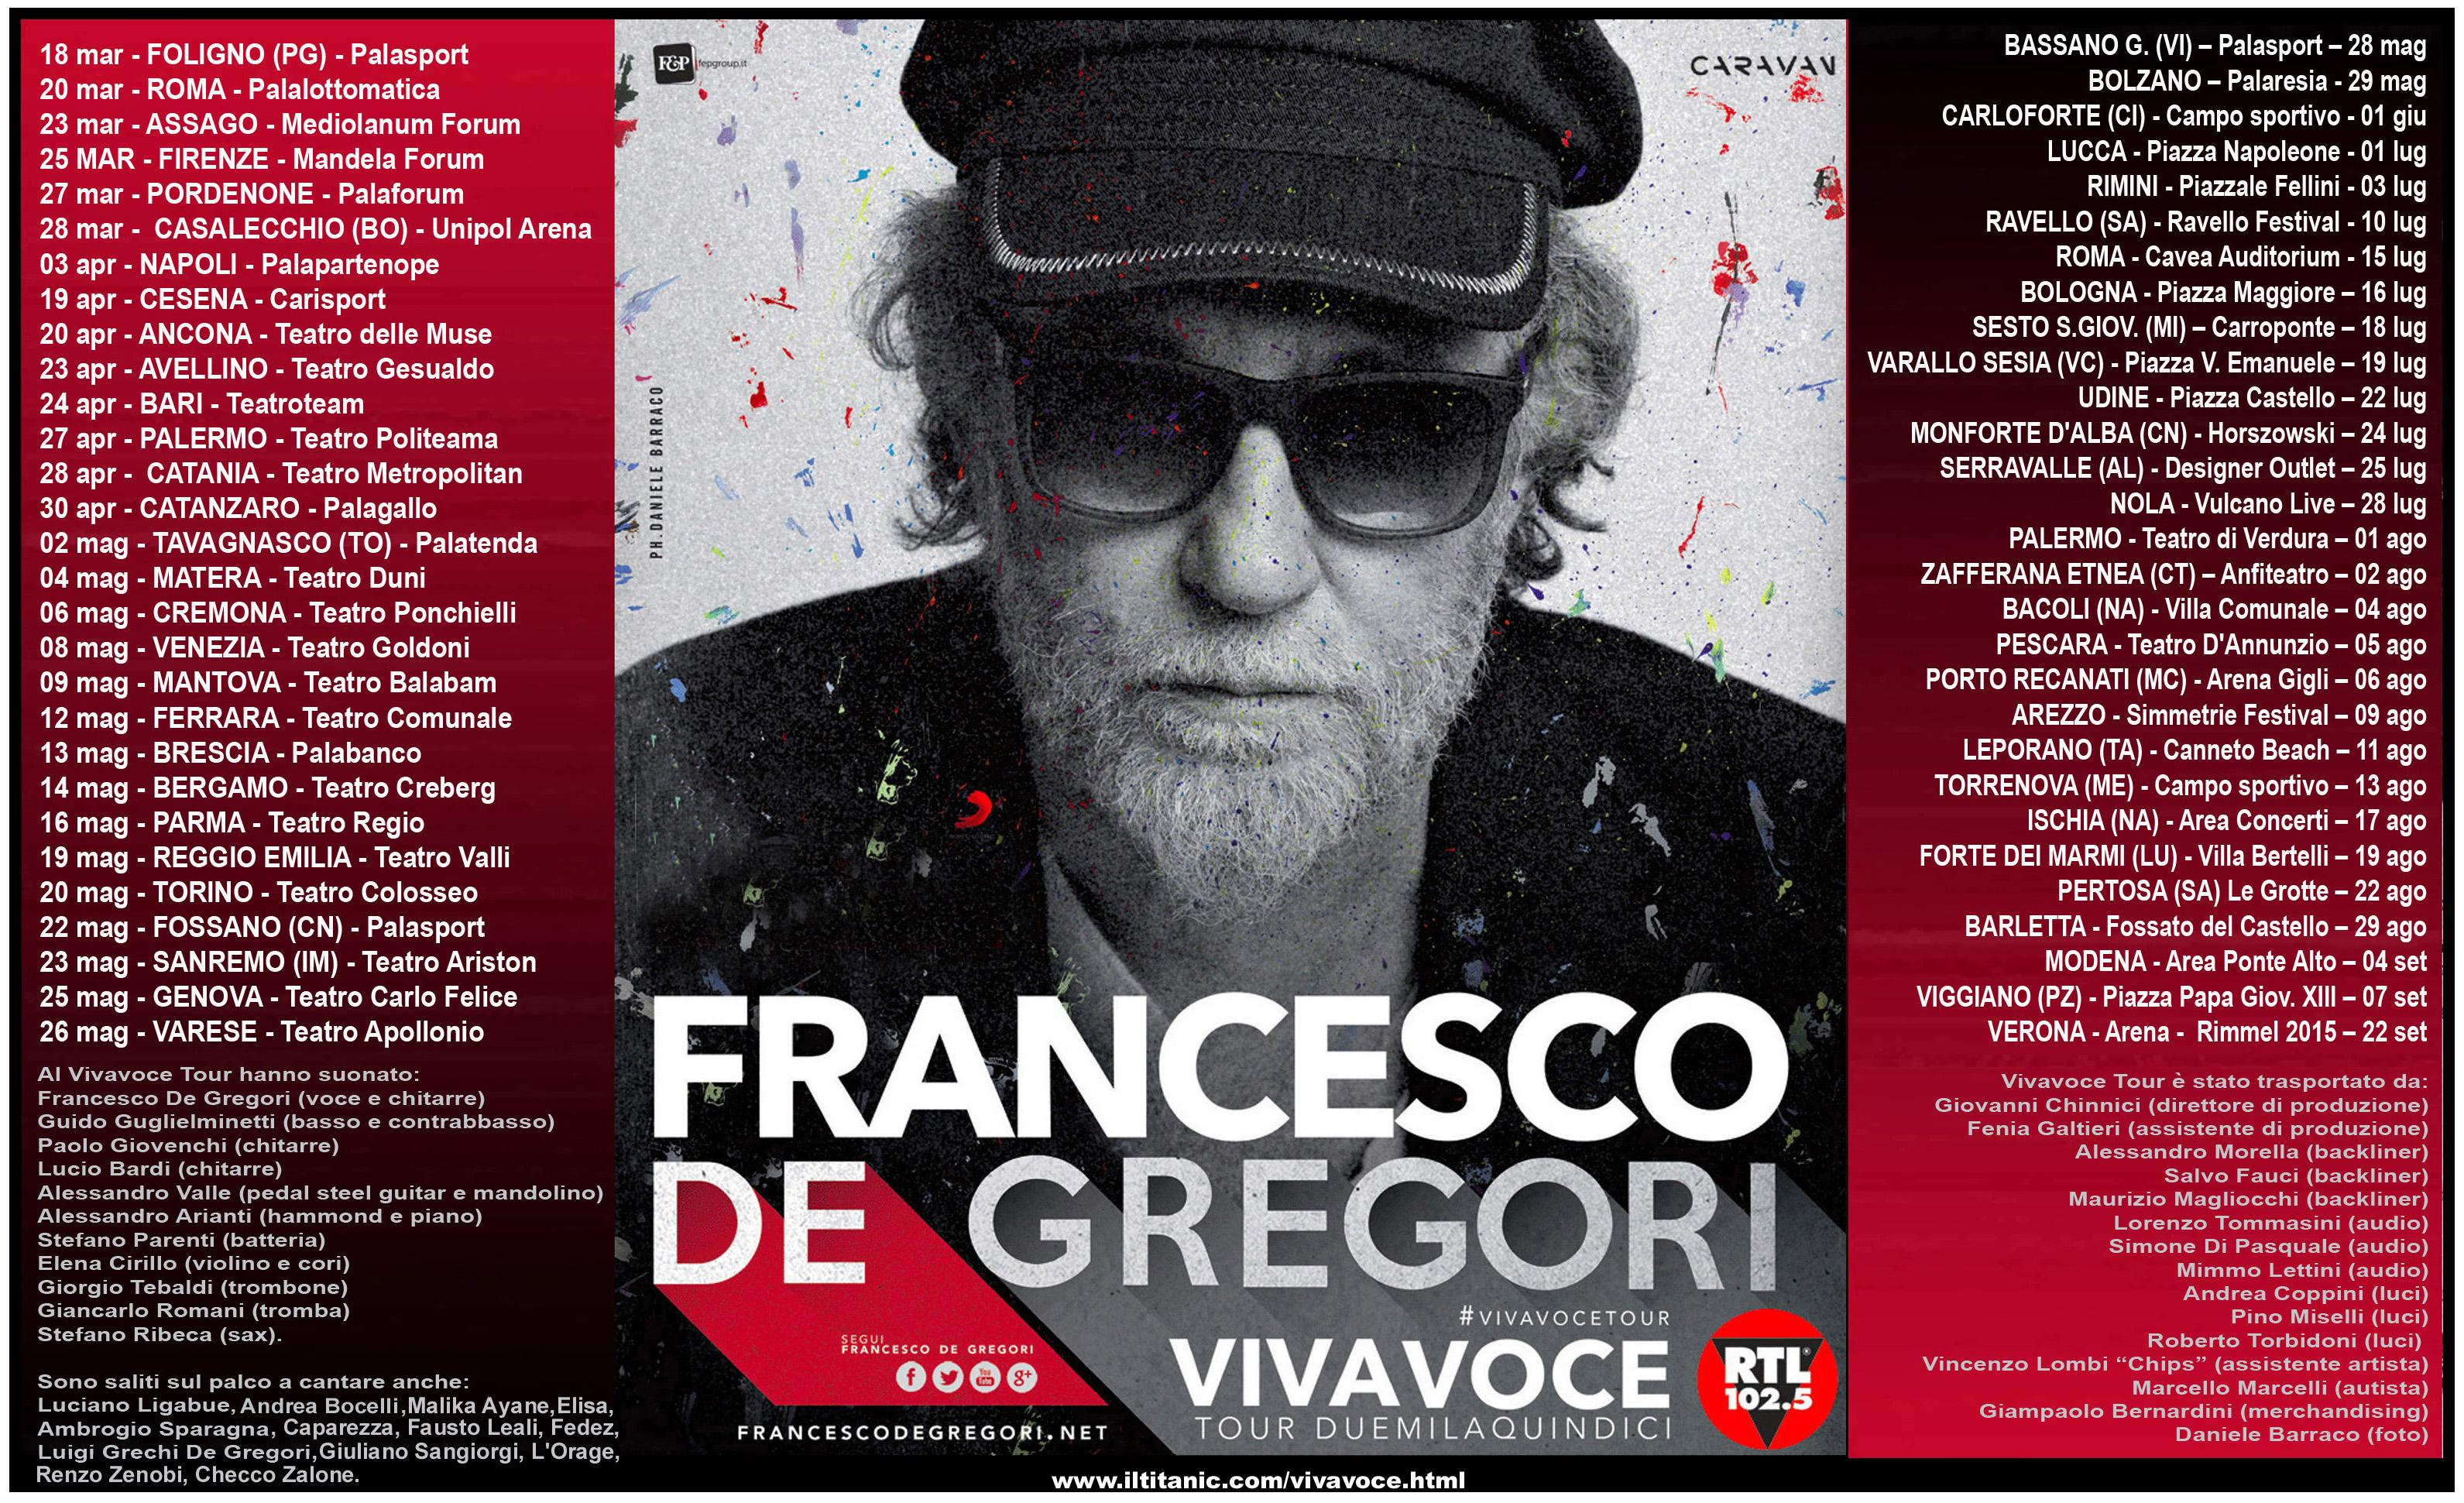 http://www.iltitanic.com/VIVAtour/pos4.jpg